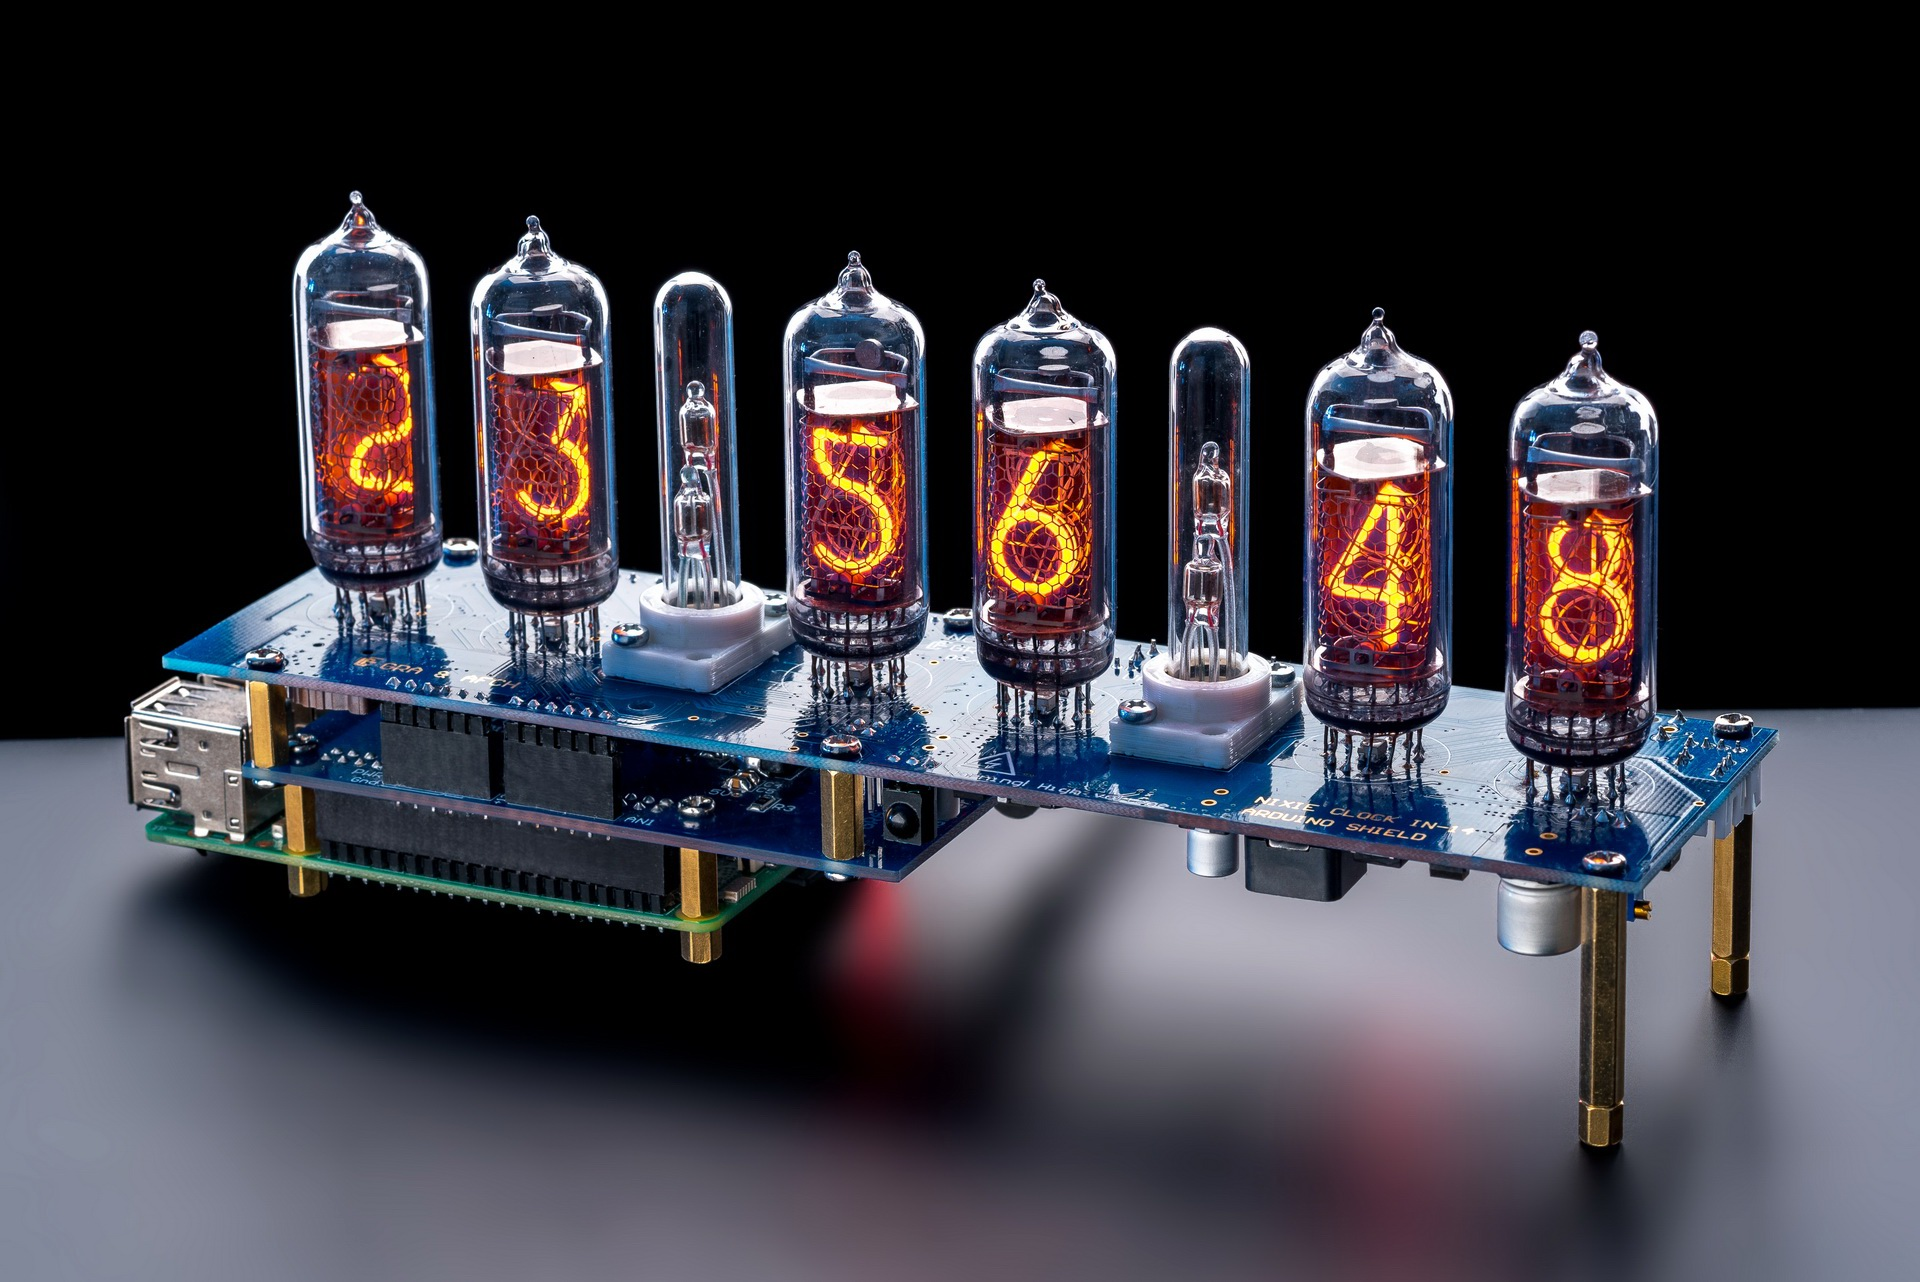 Raspberry Pi HAT Nixie Tubes Clock NCS314 for IN-14 Nixie Tubes, Options:  Tubes, GPS, Remote, Arduino, Columns